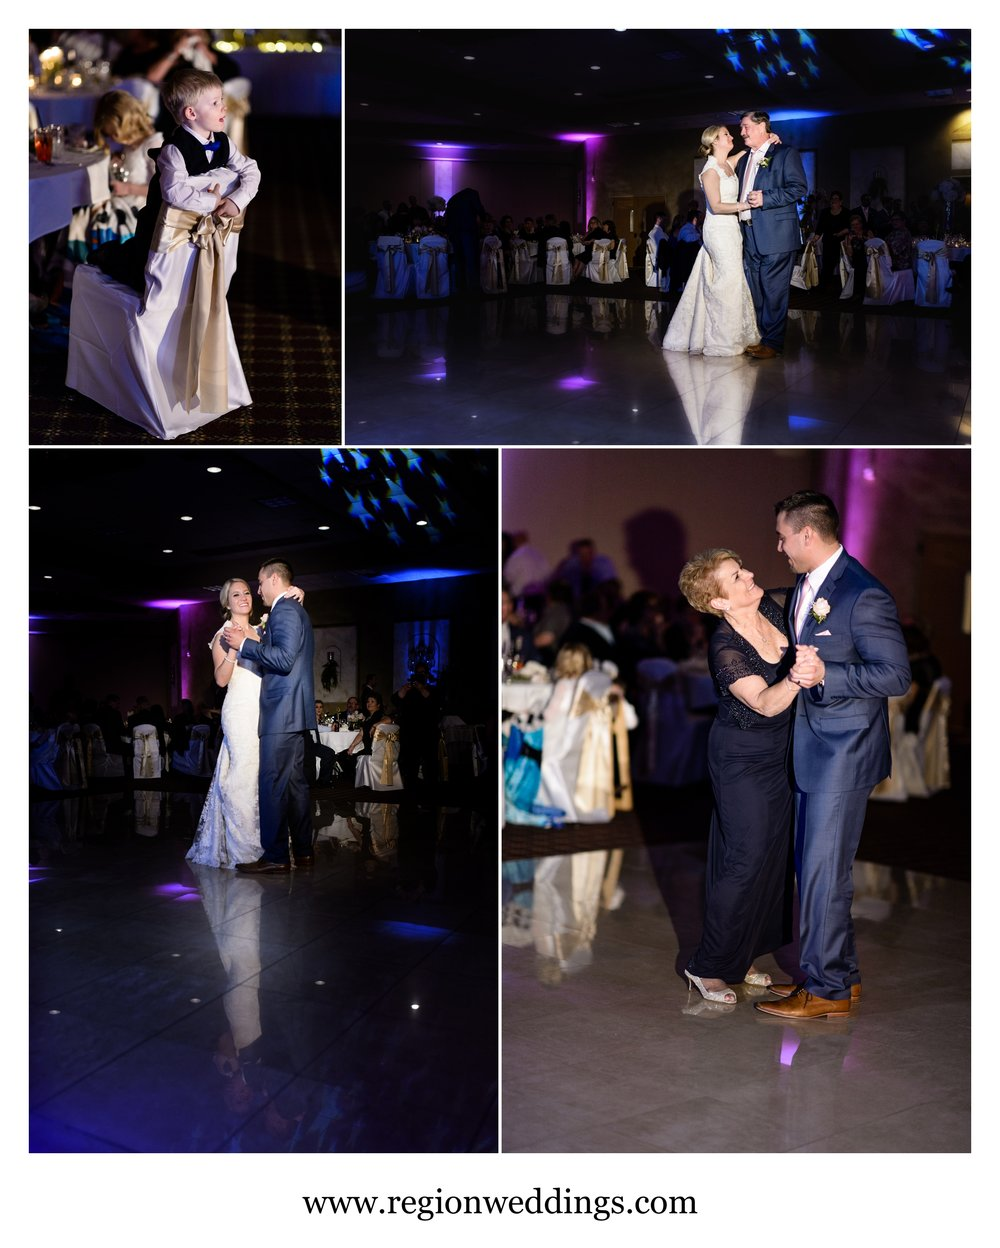 First dances at Villa Cesare in Schererville, Indiana.